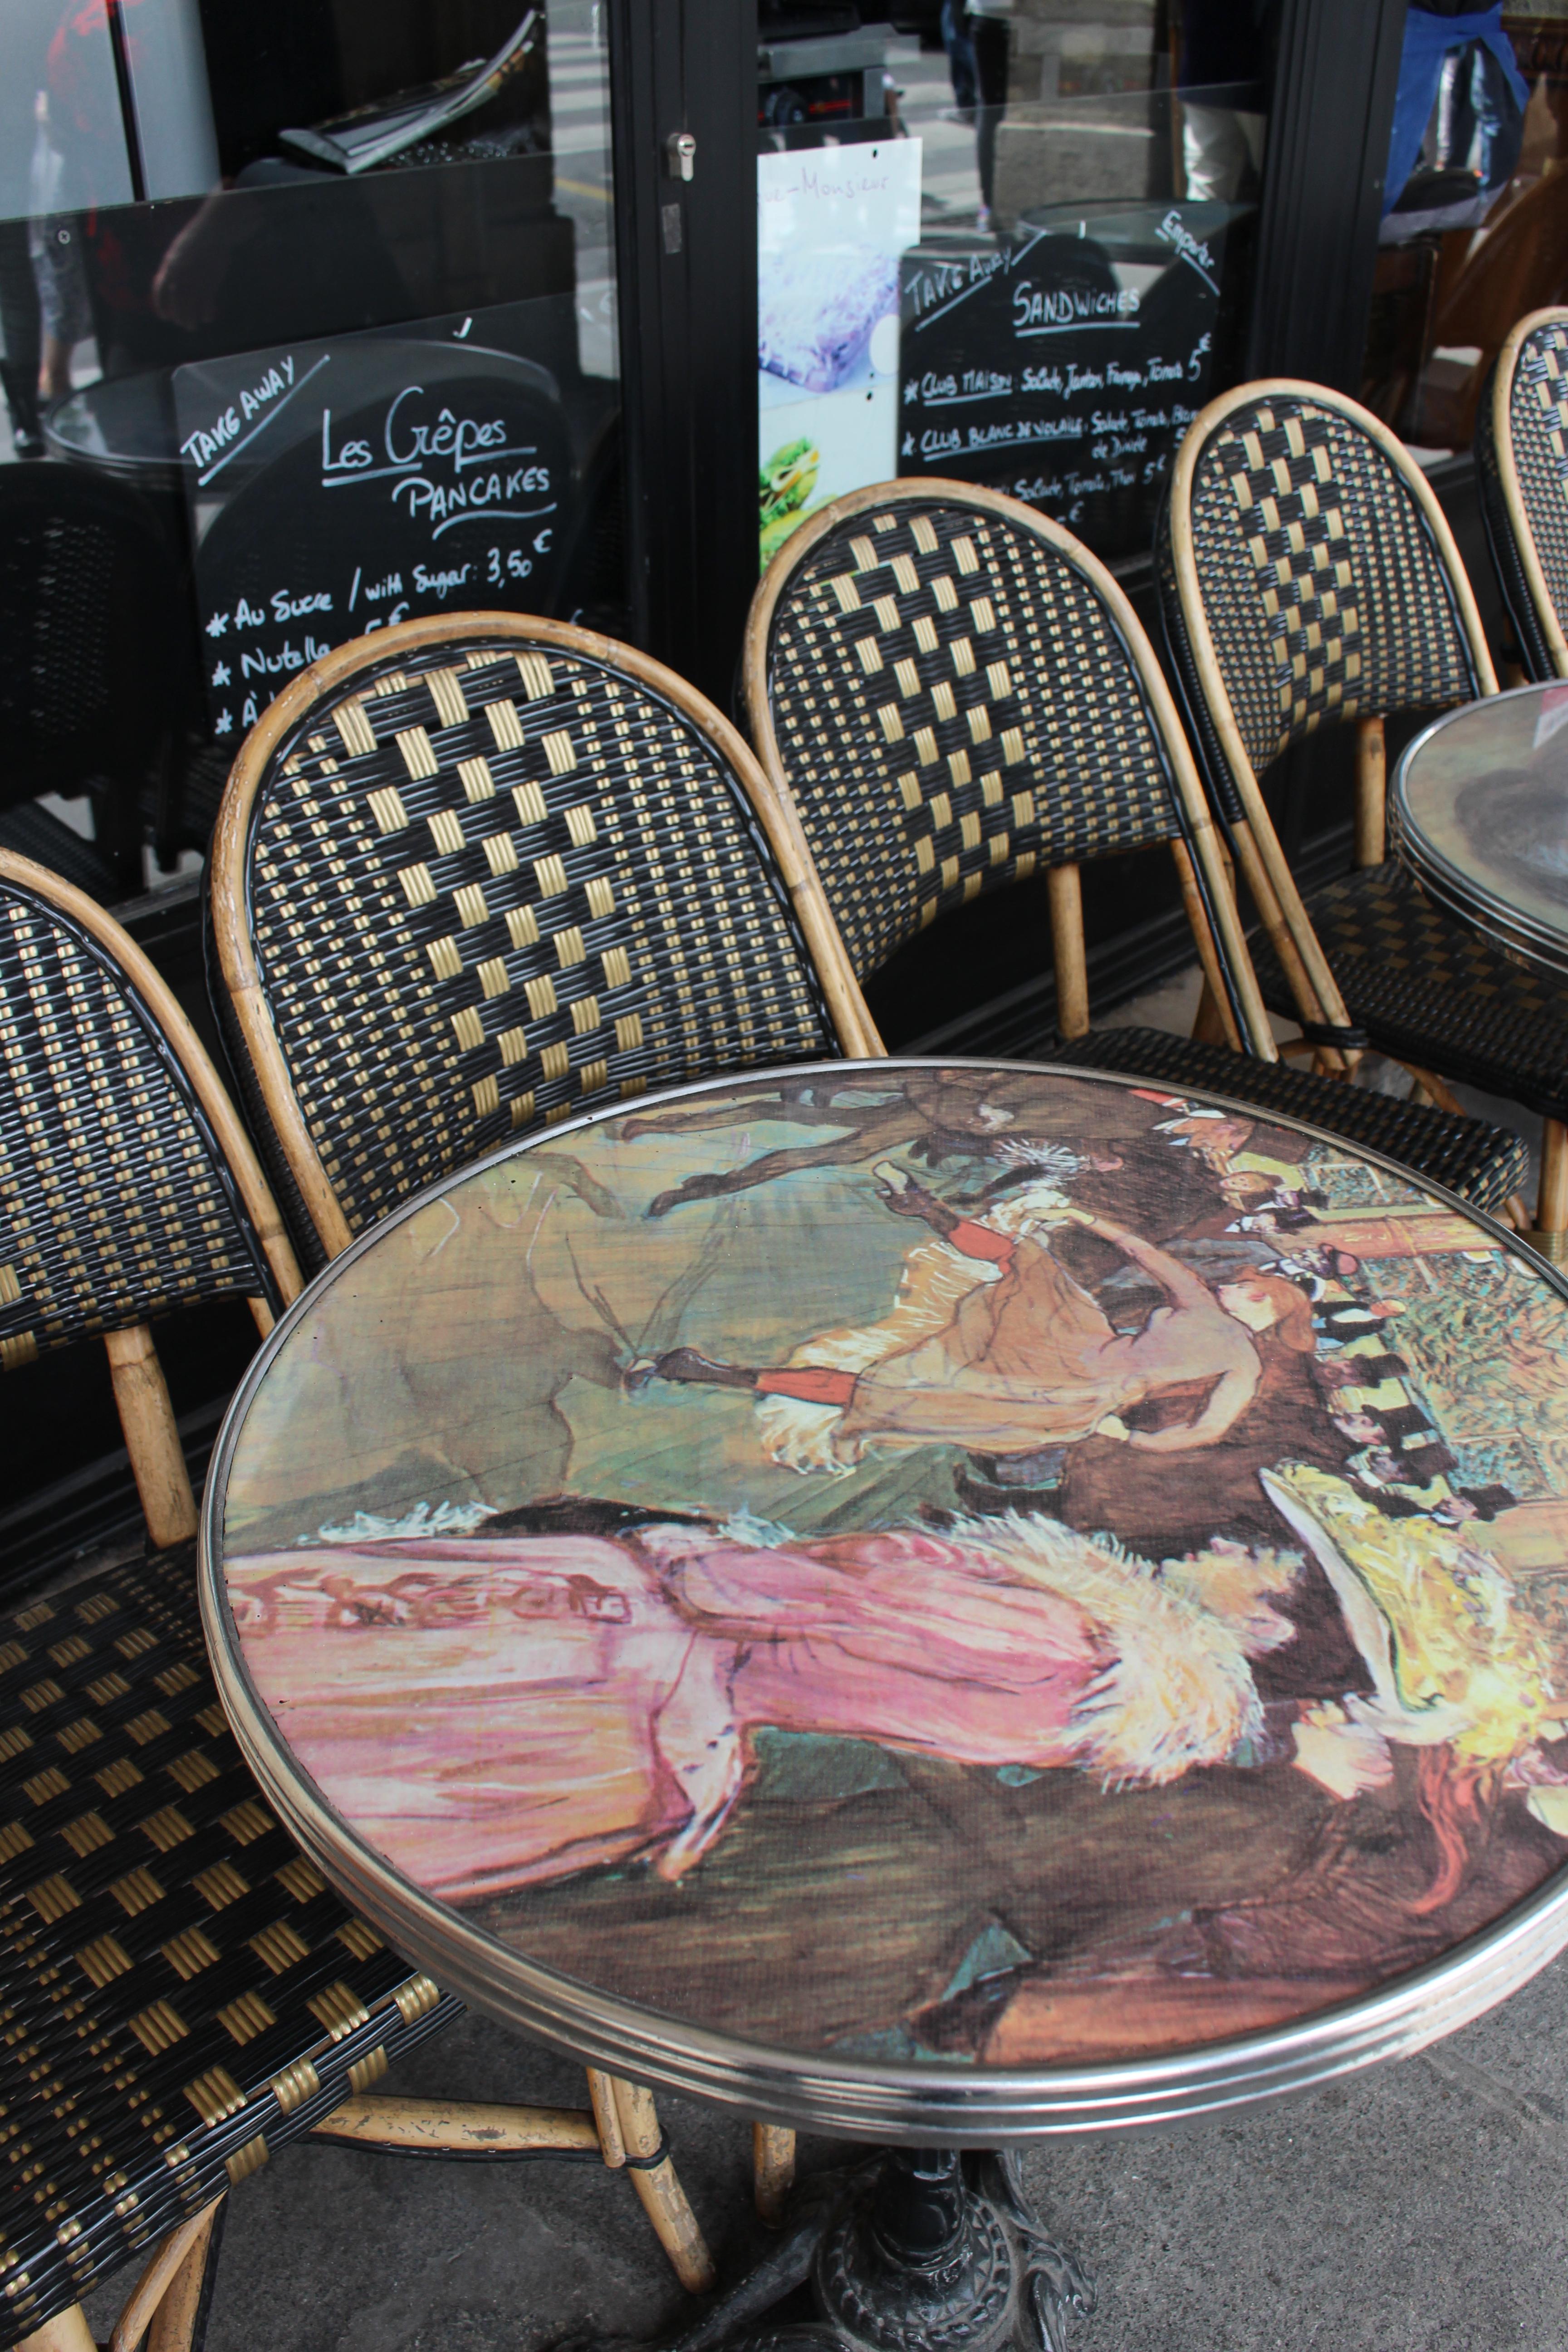 Cafe somewhere in Paris